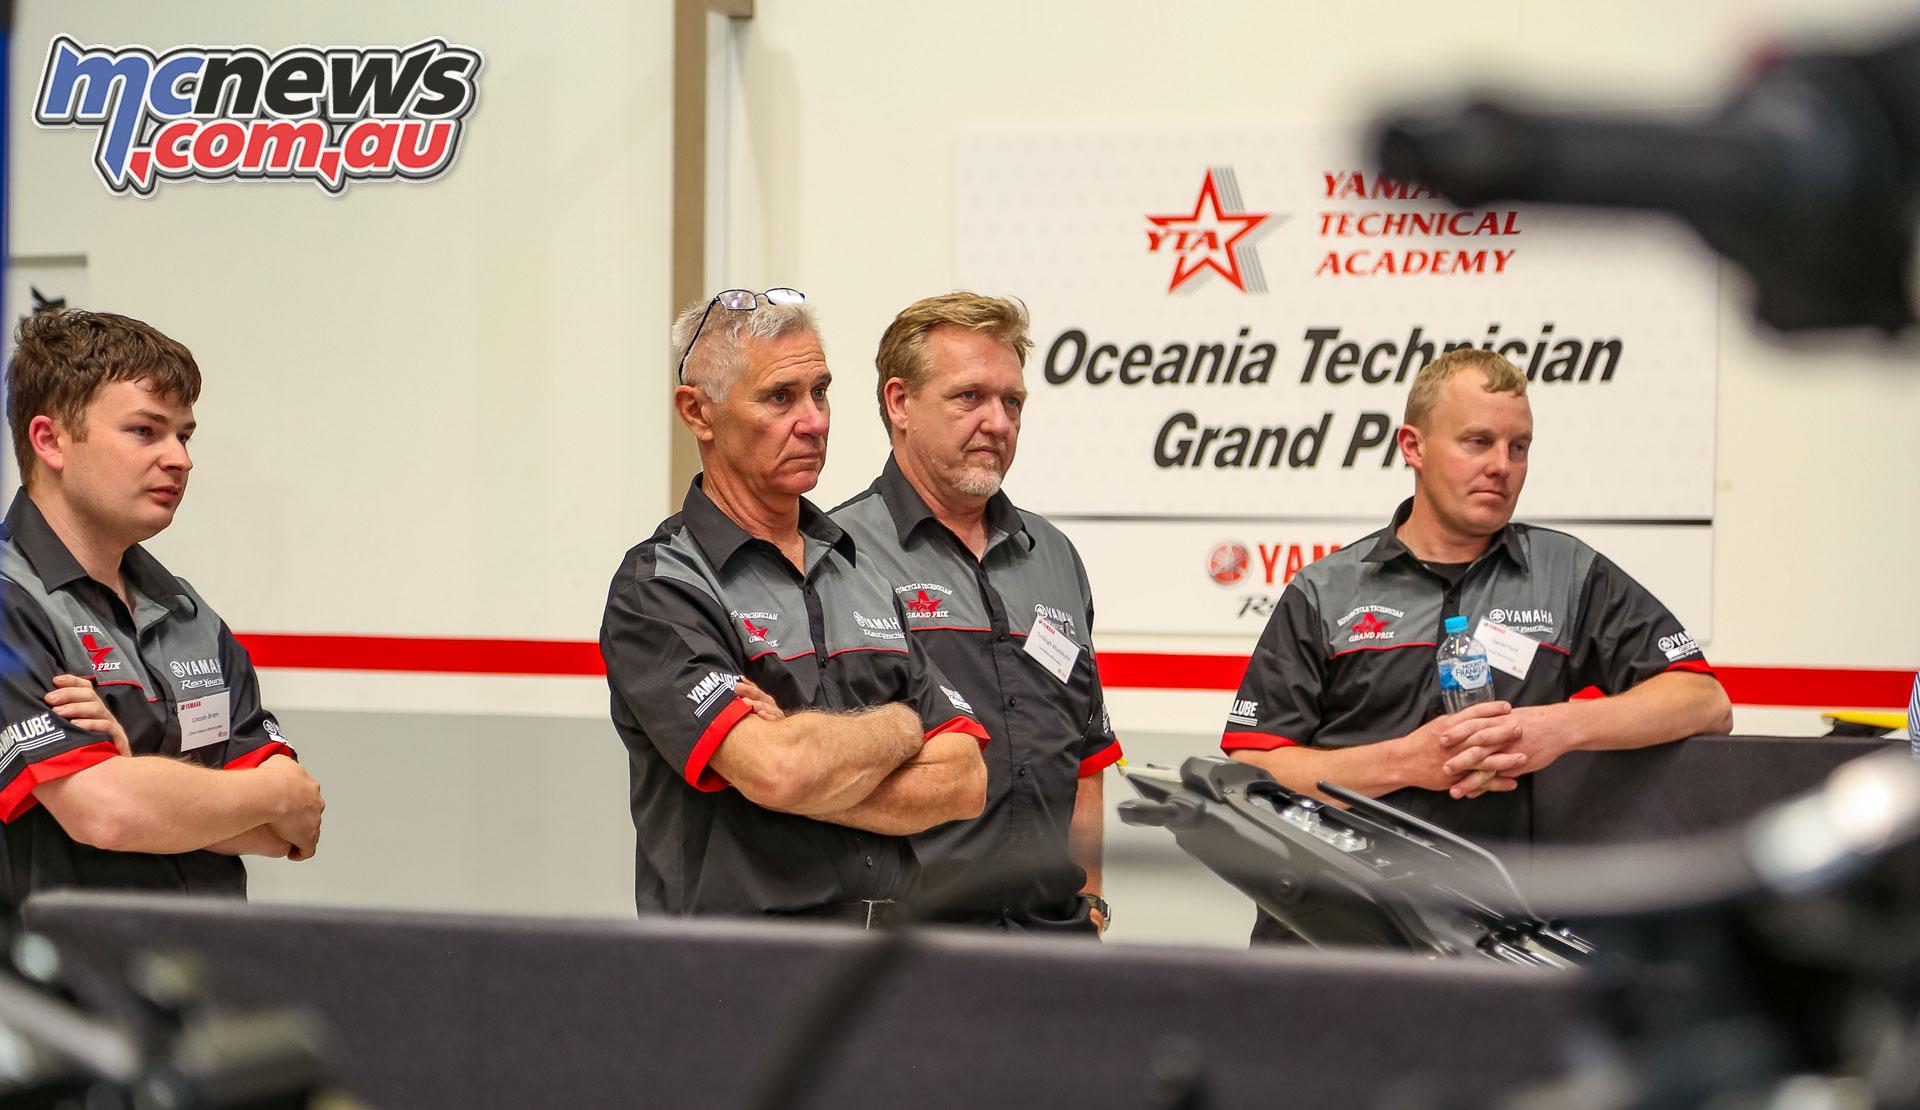 Oceania Motorcycle Technician Grand Prix